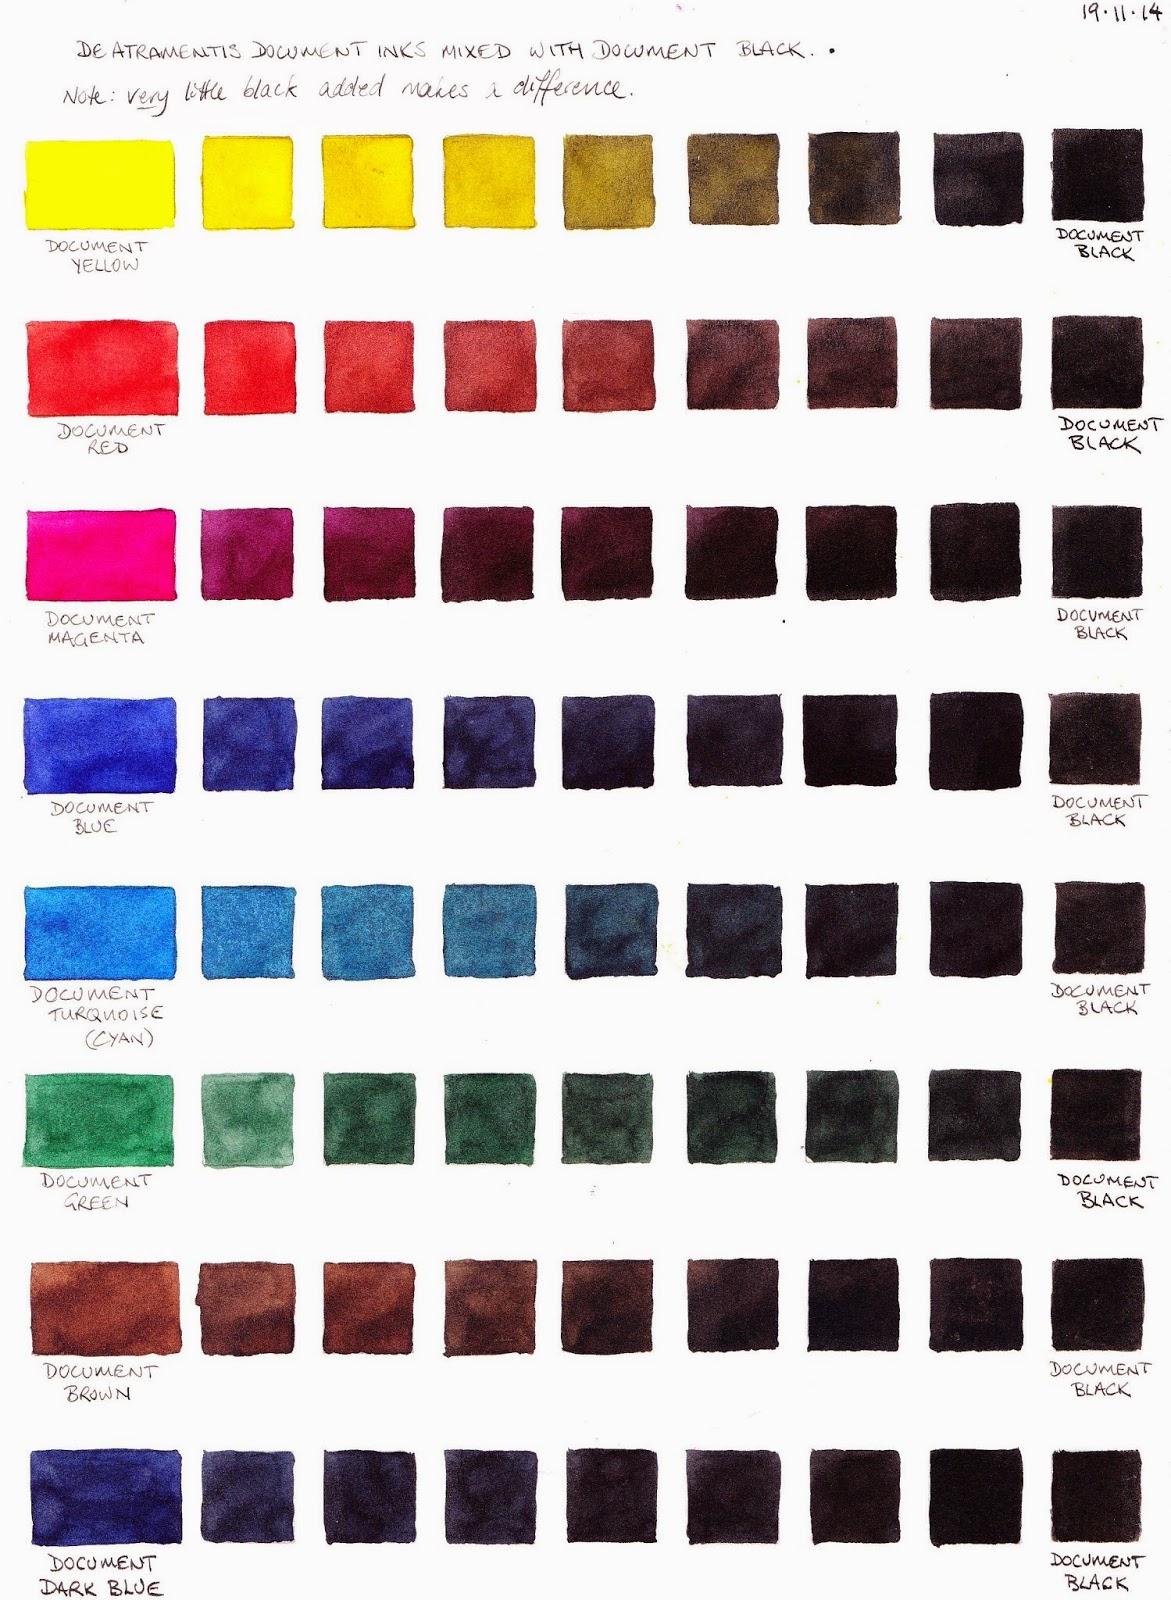 De Atramentis Ink : atramentis, Blundell, Artist:, Atramentis, Document, Mixed, Black, Updated, January